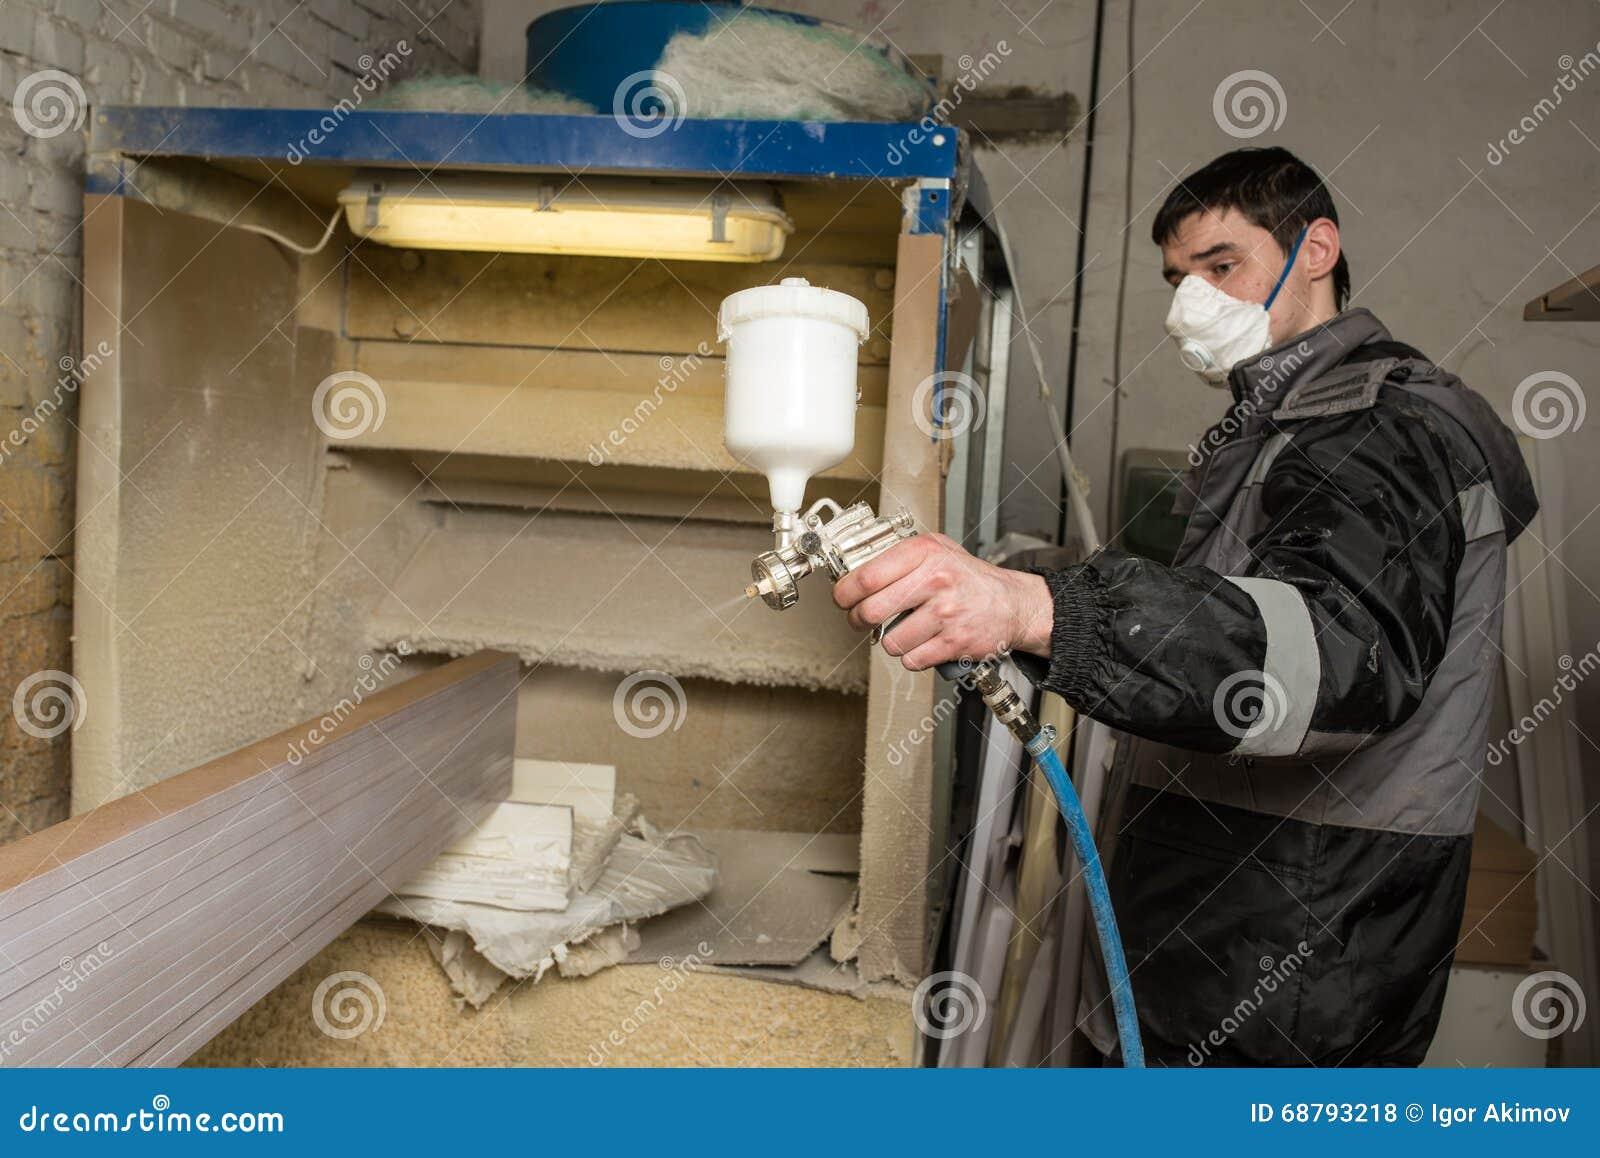 editorial stock photo download carpenter painter paints the furniture - Furniture Painter